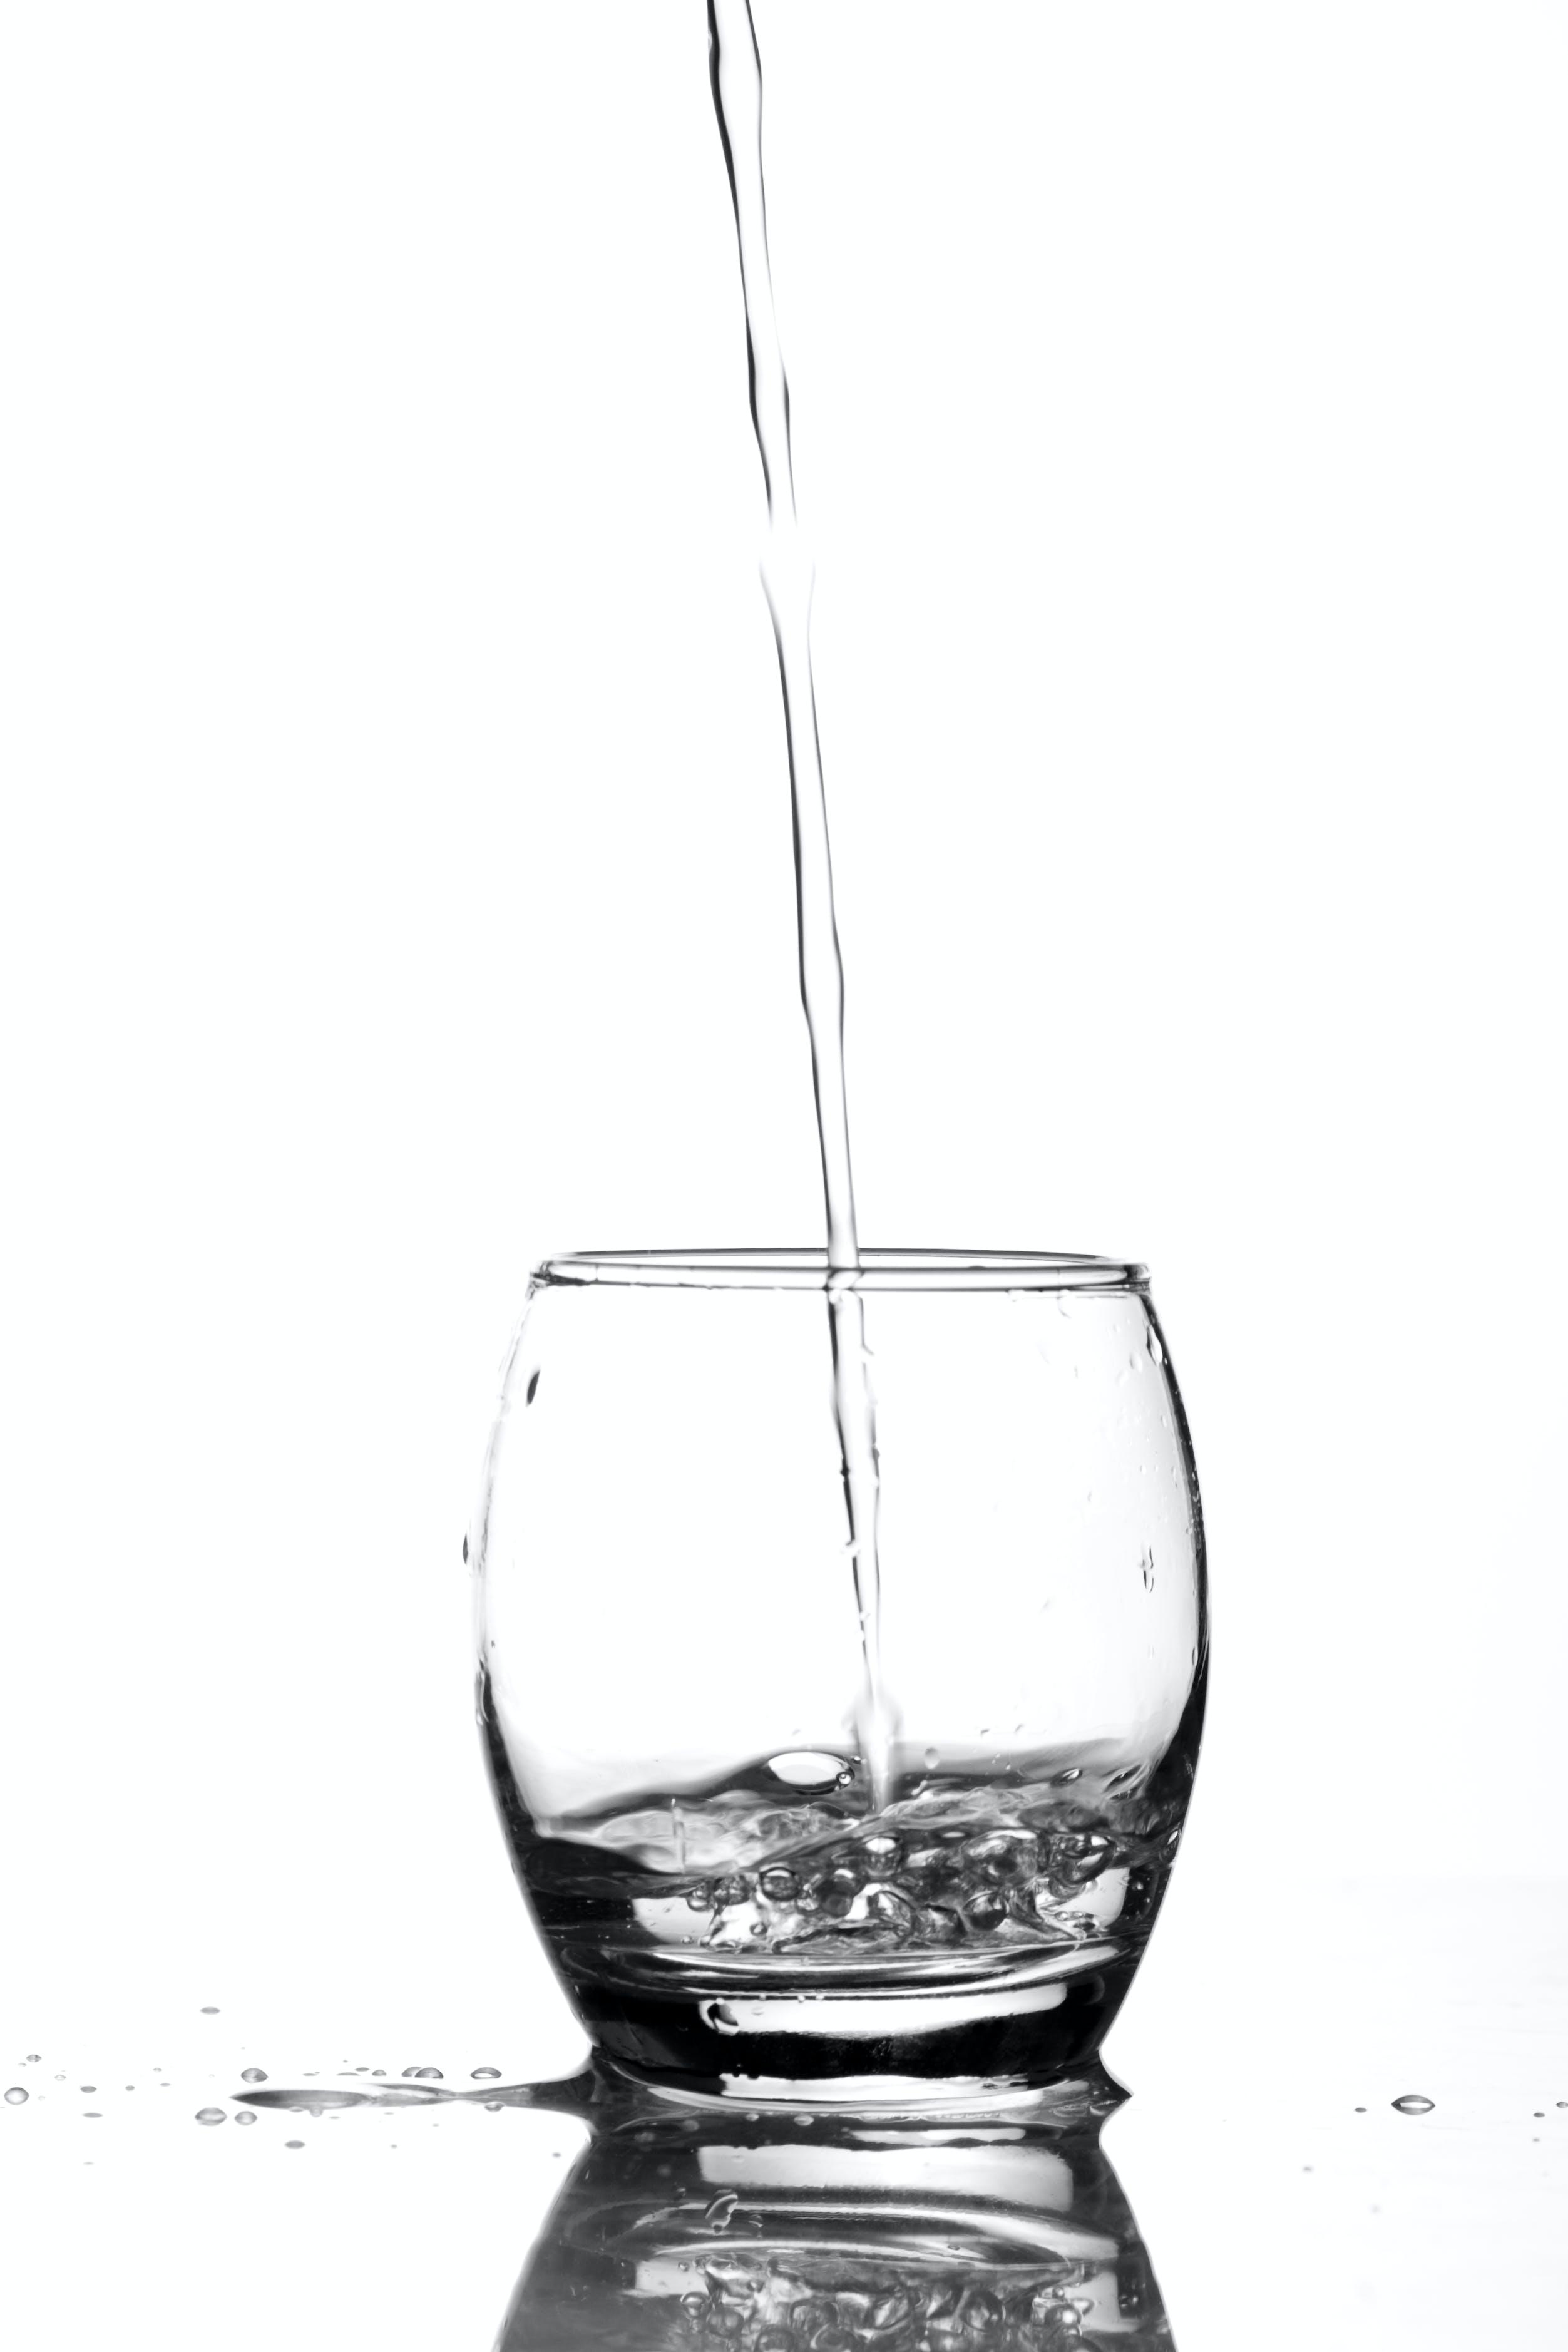 agua, beber, bebida